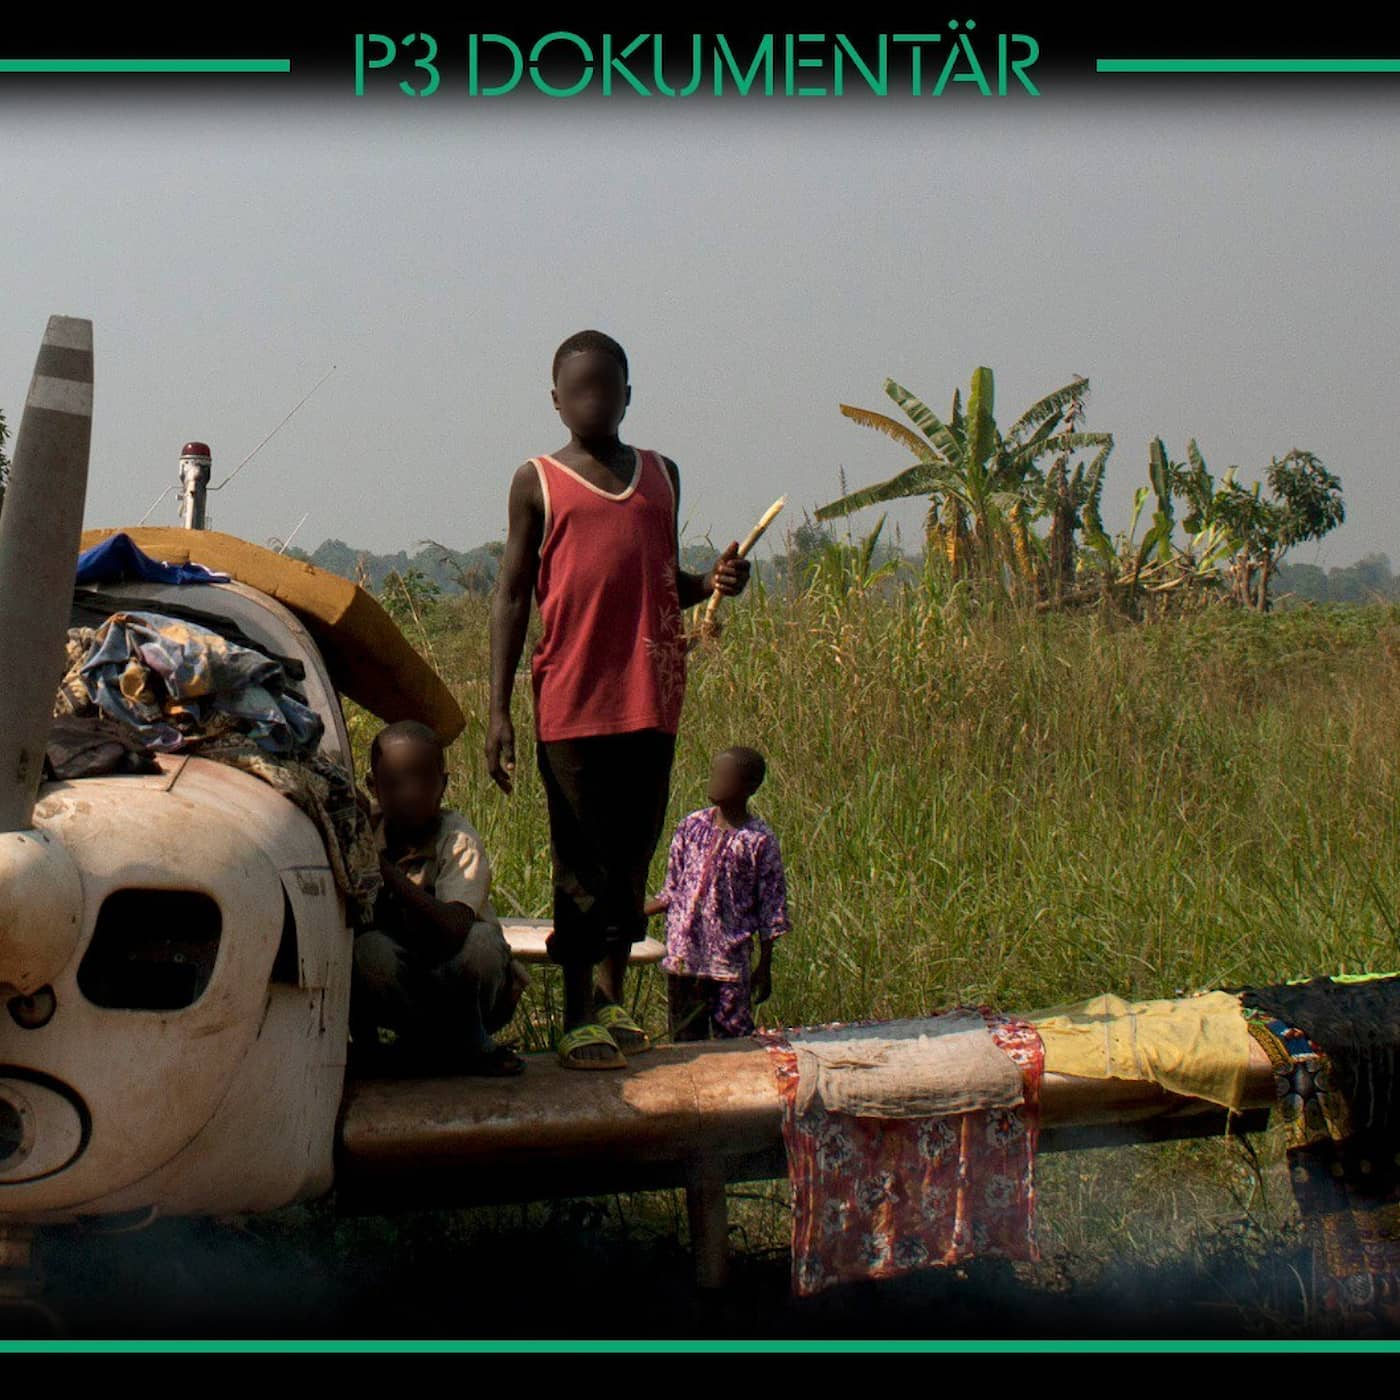 FN och pedofilskandalen